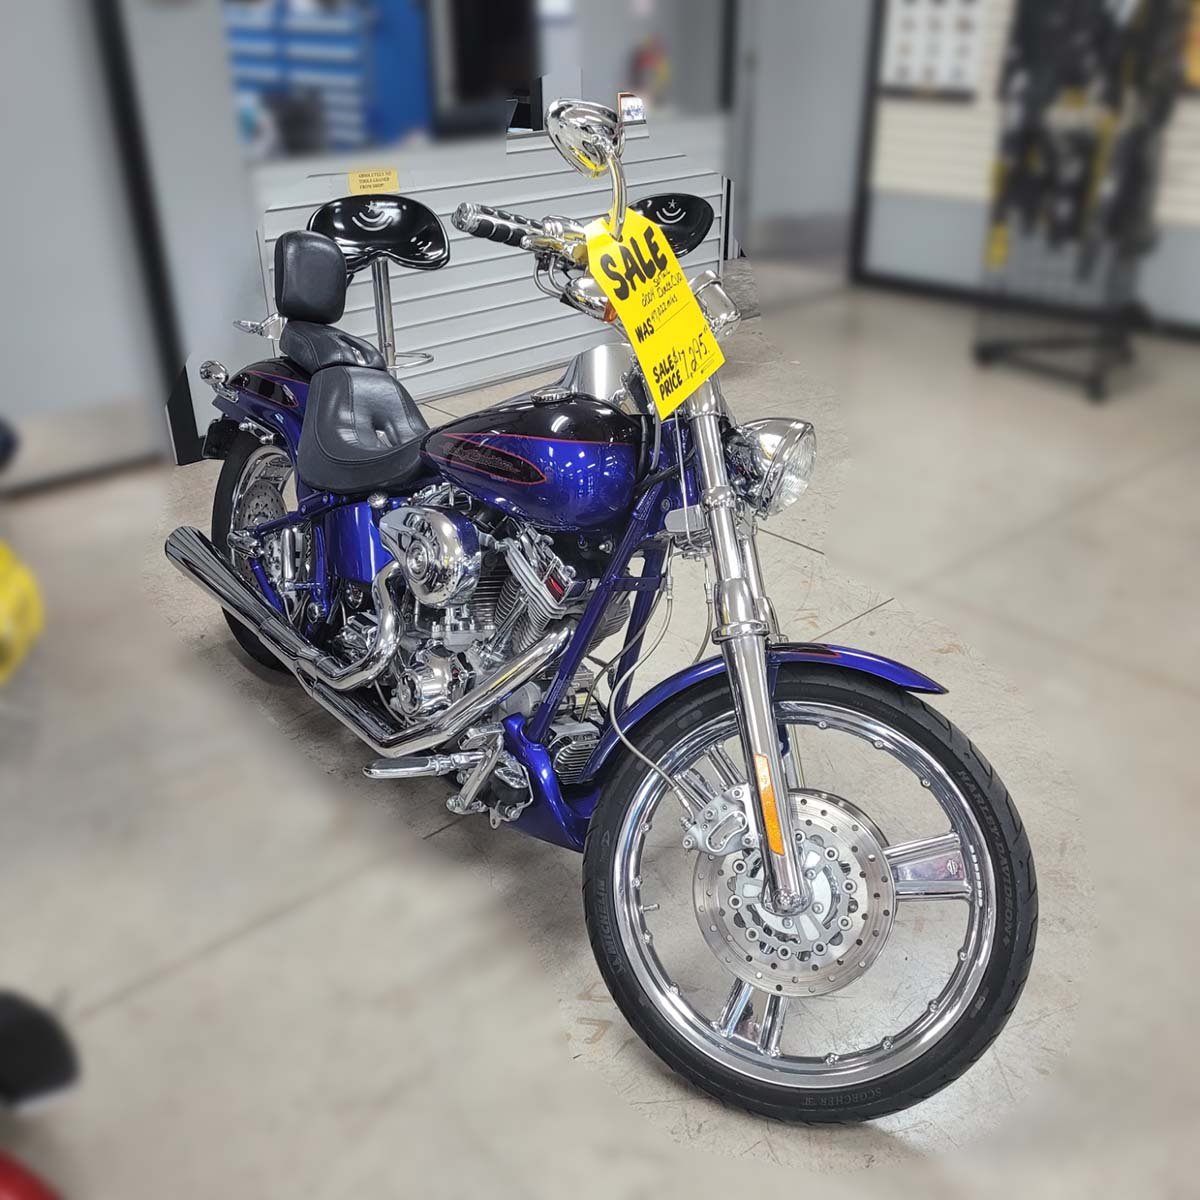 SOLD – 2004 Harley-Davidson Softail Deuce CVO